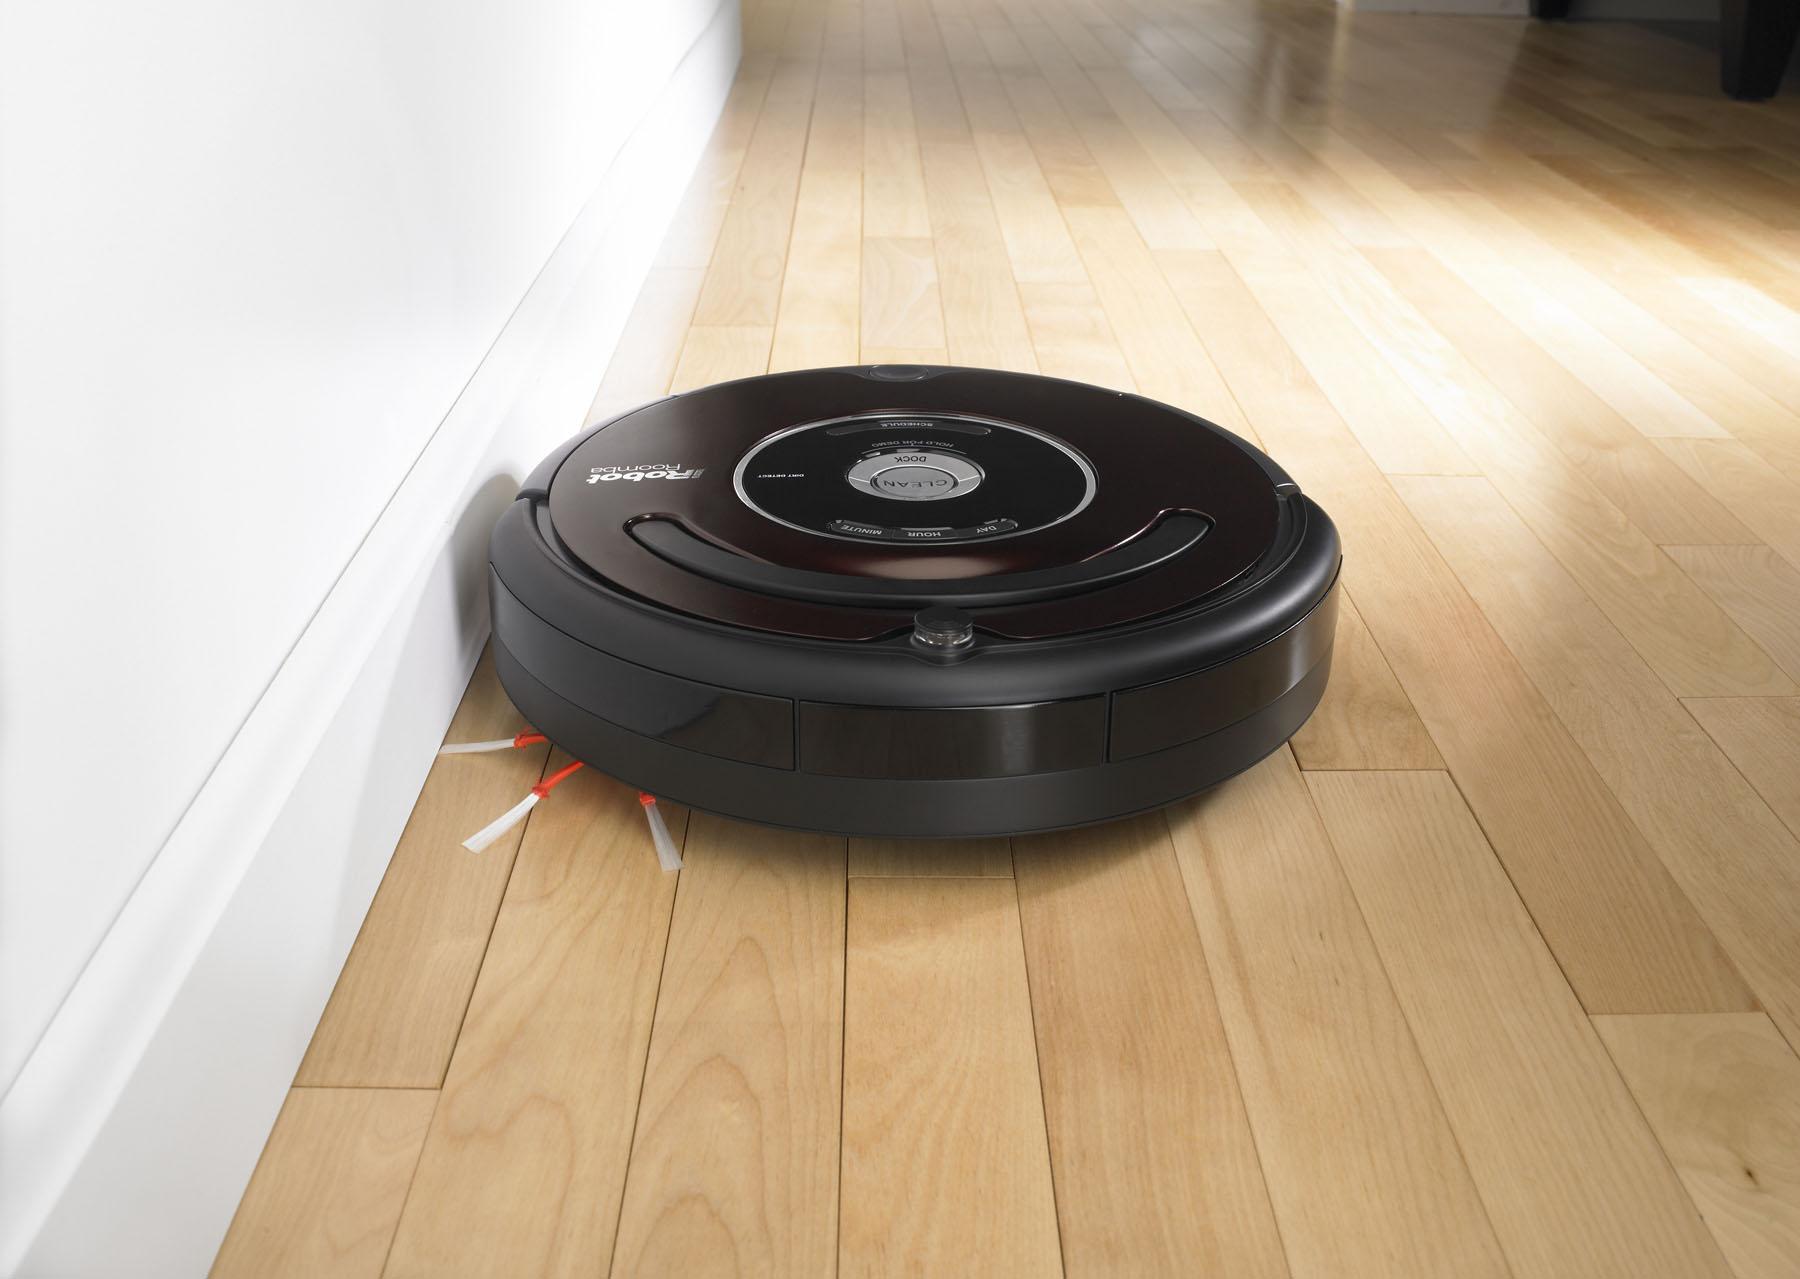 iRobot's Roomba